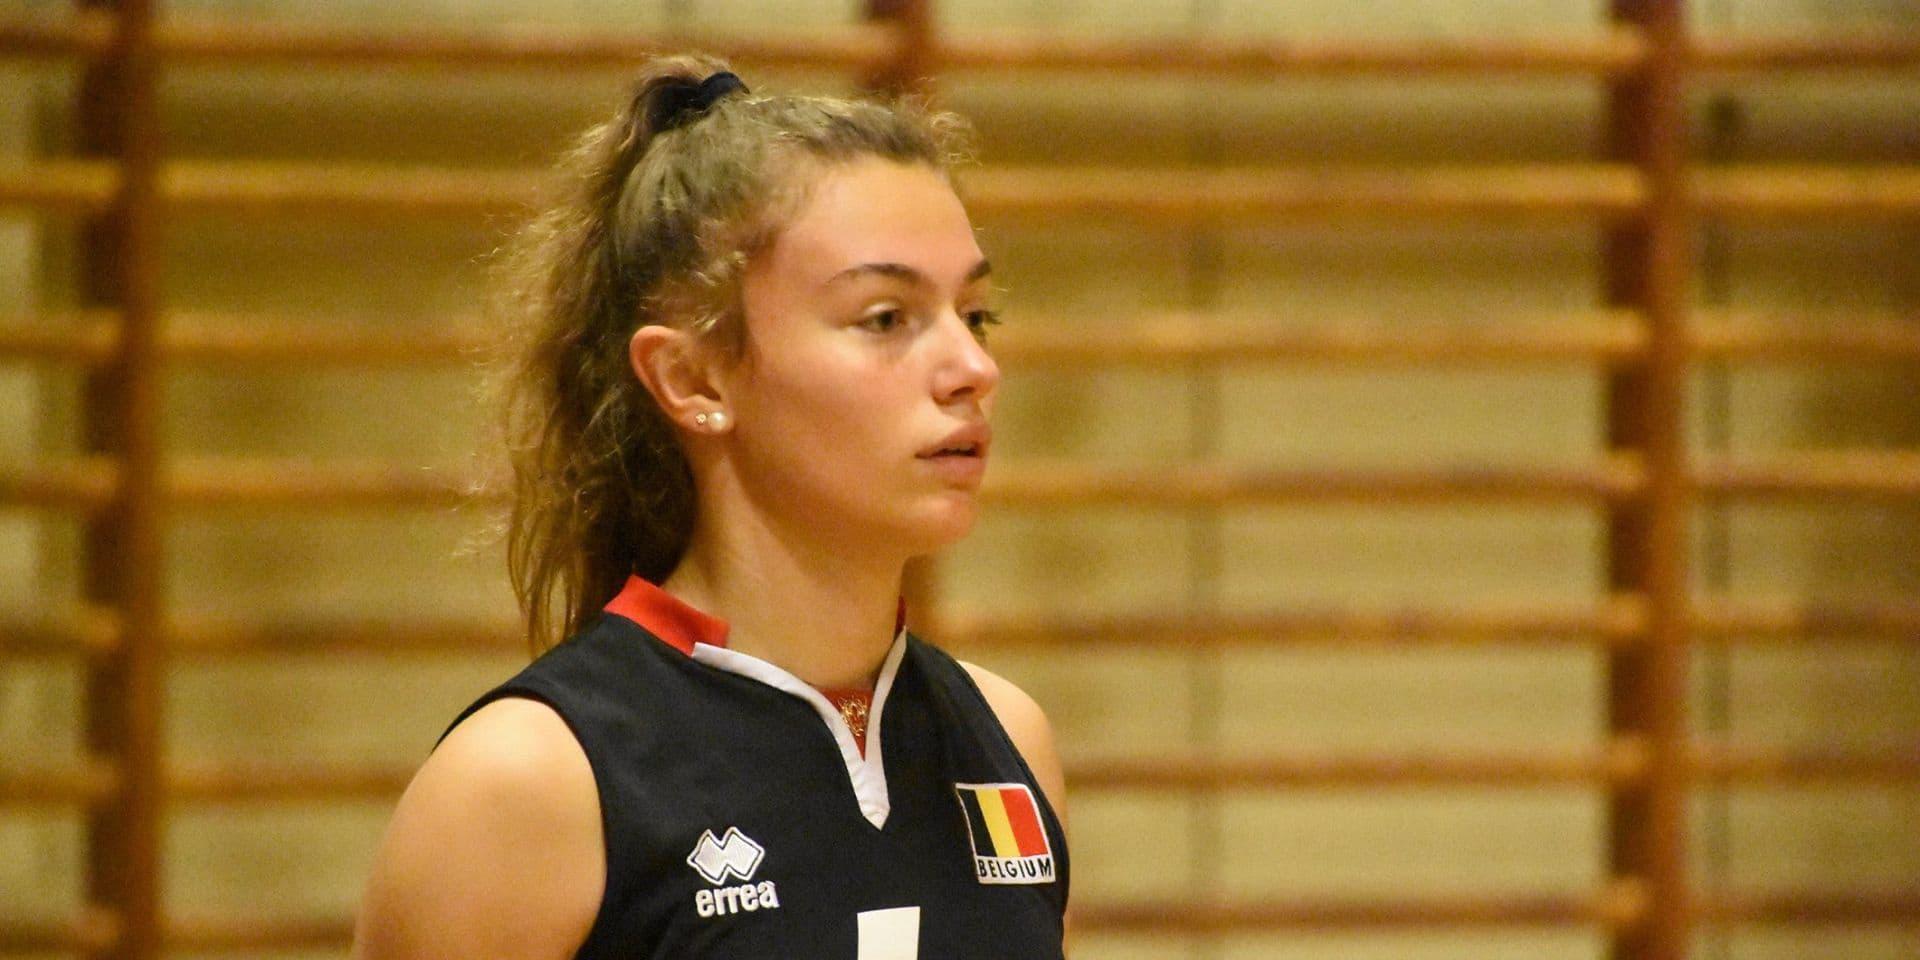 Volley-ball: A 16 ans, Romane Neufkens dispute le Mondial U20